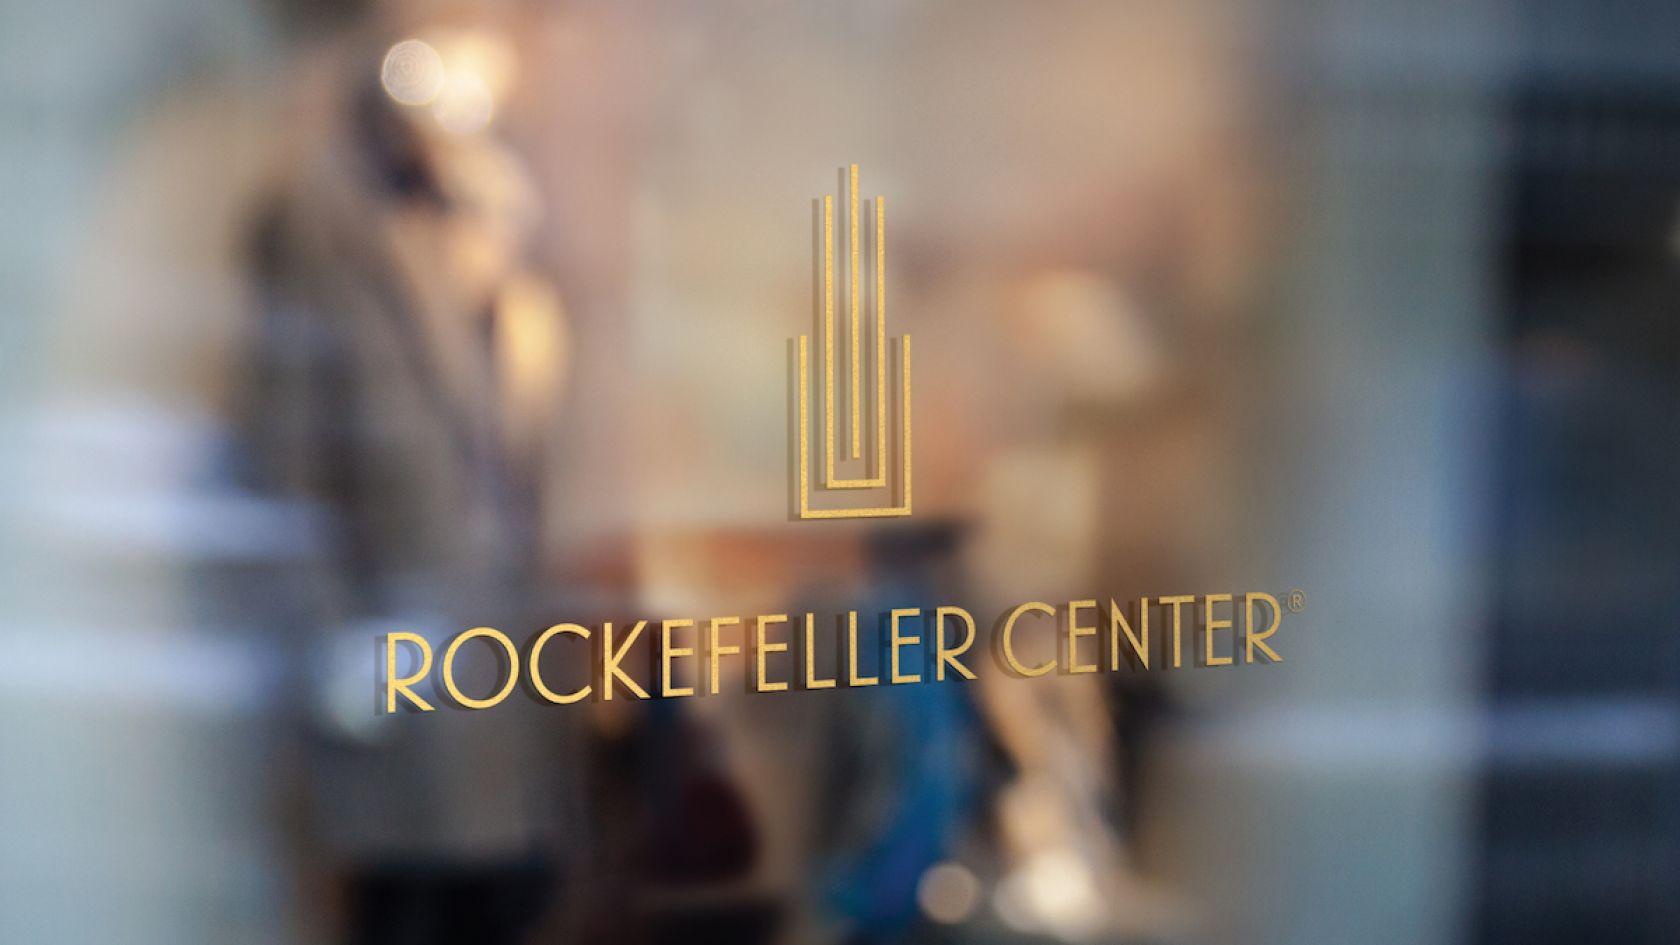 The iconic Rockefeller Center building in New York just got new branding